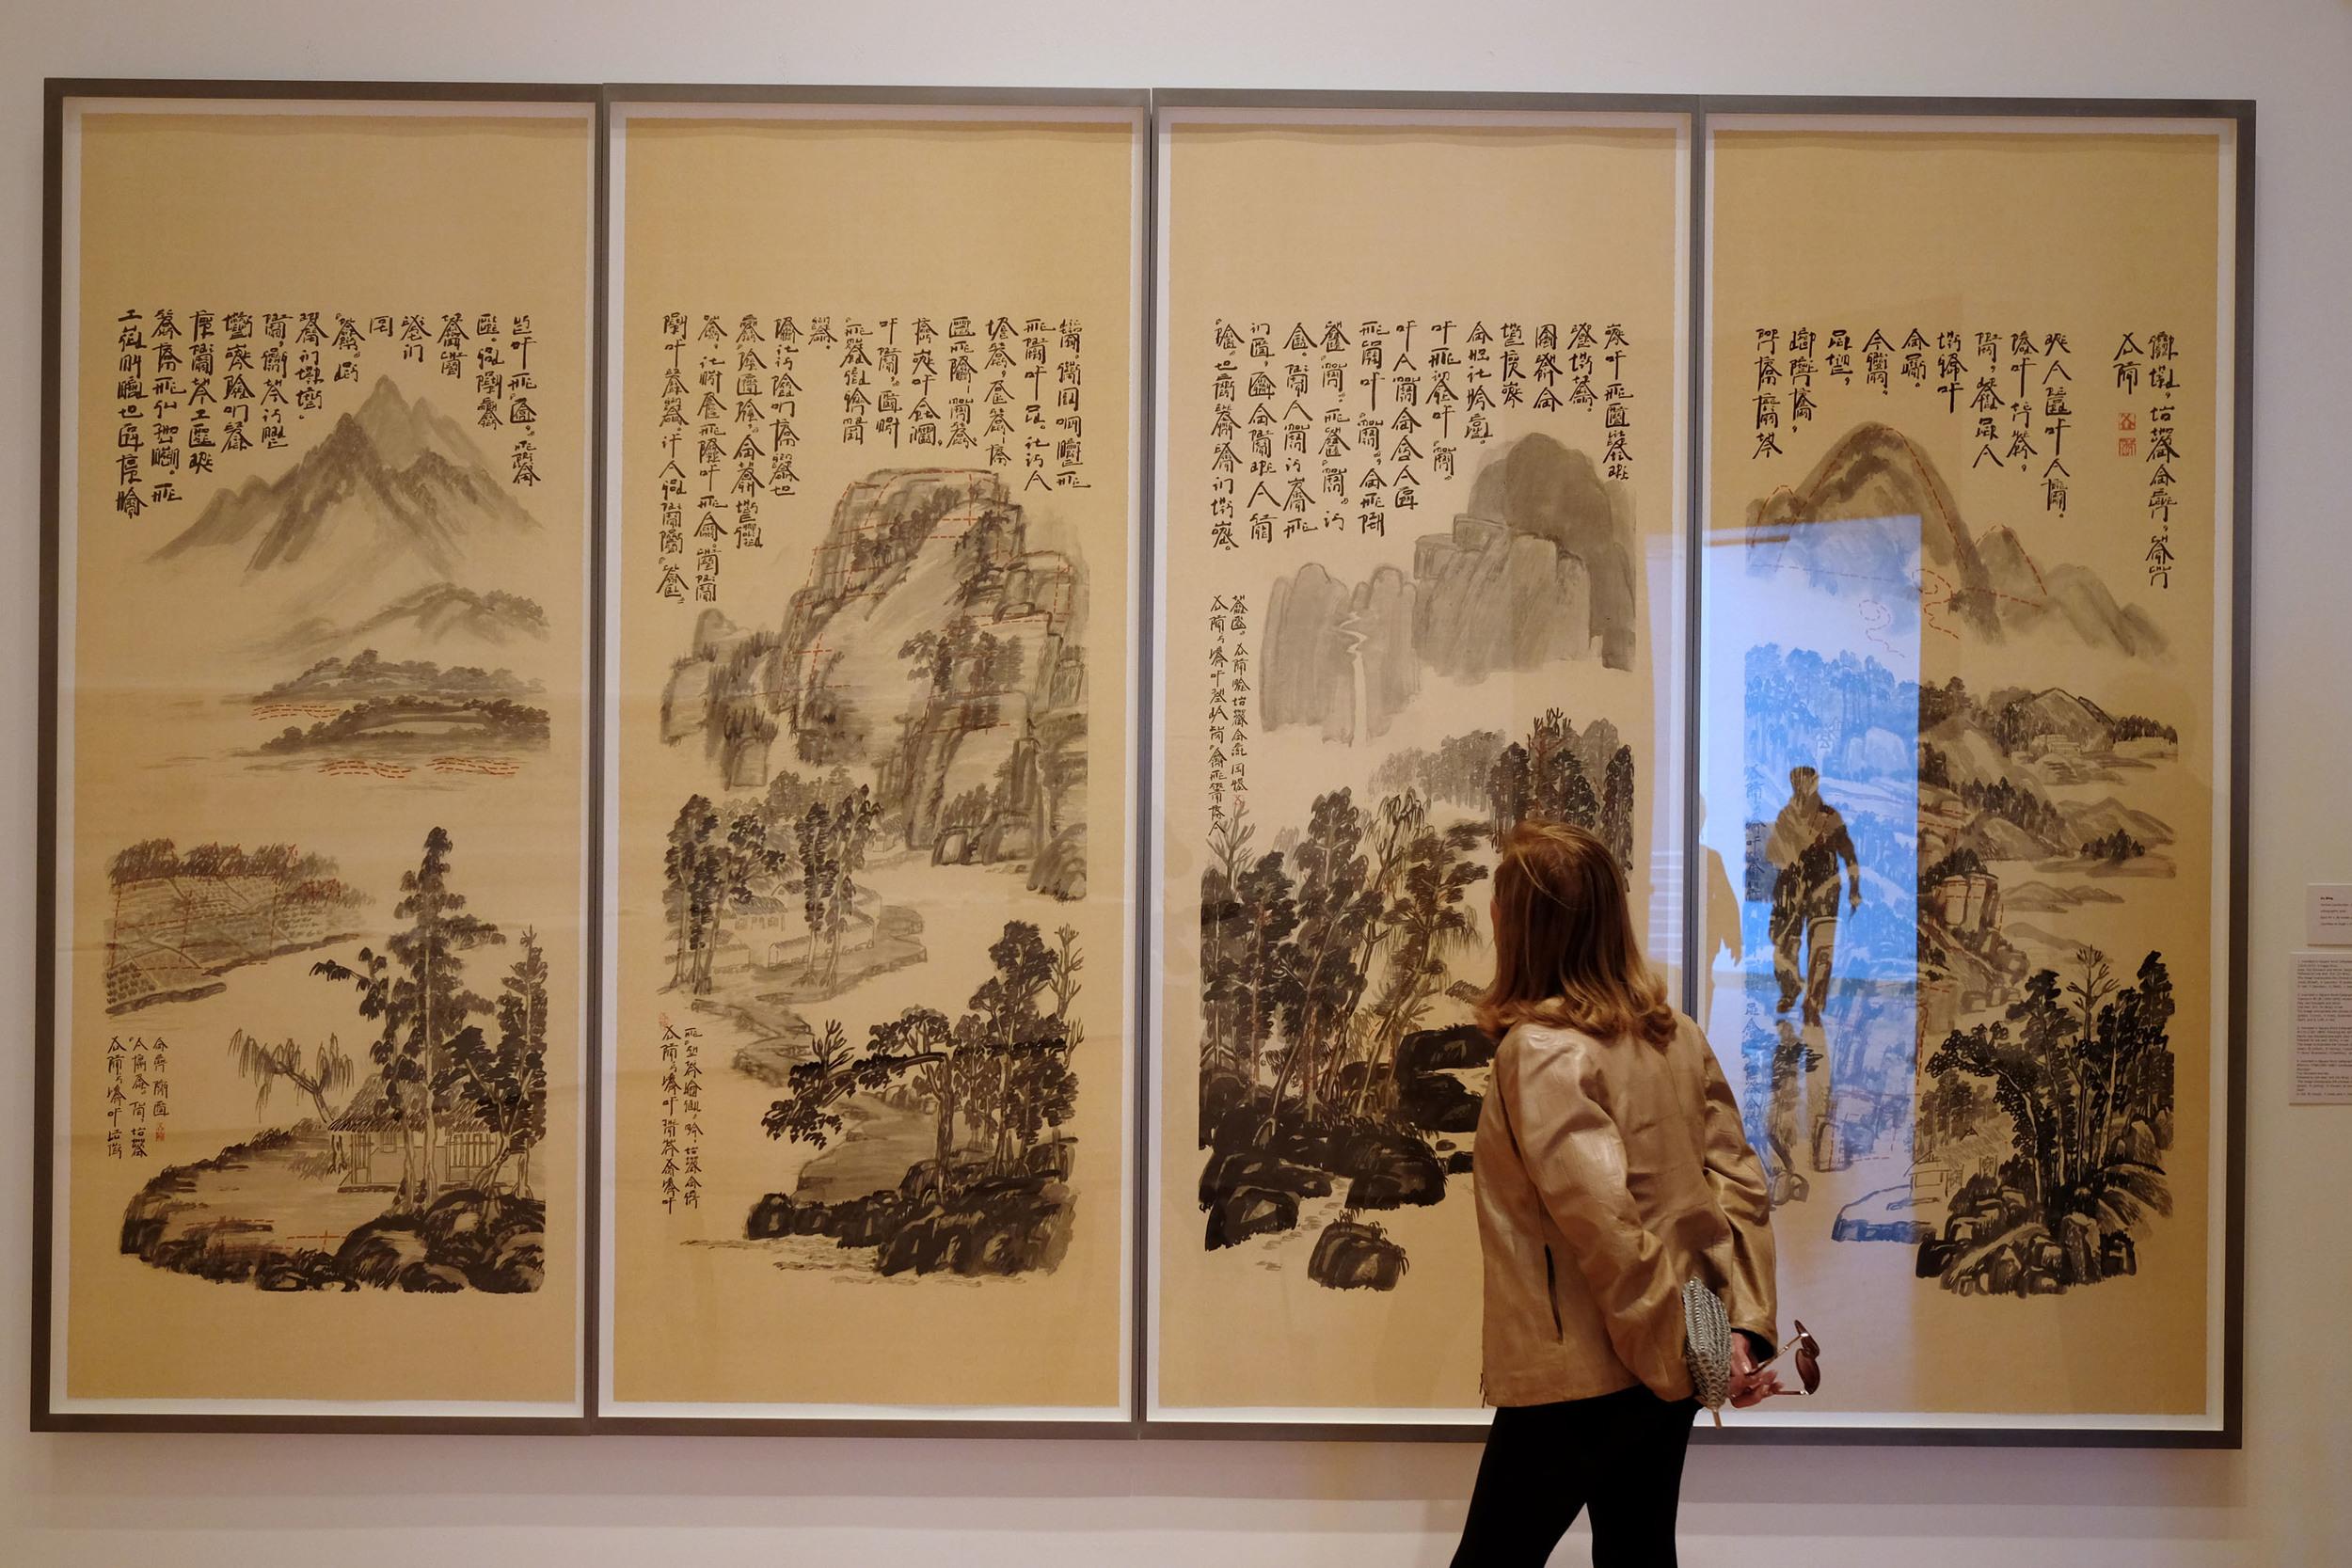 Vistas de Suzhou Landscripts (Paisajes de Letras), 2004-12